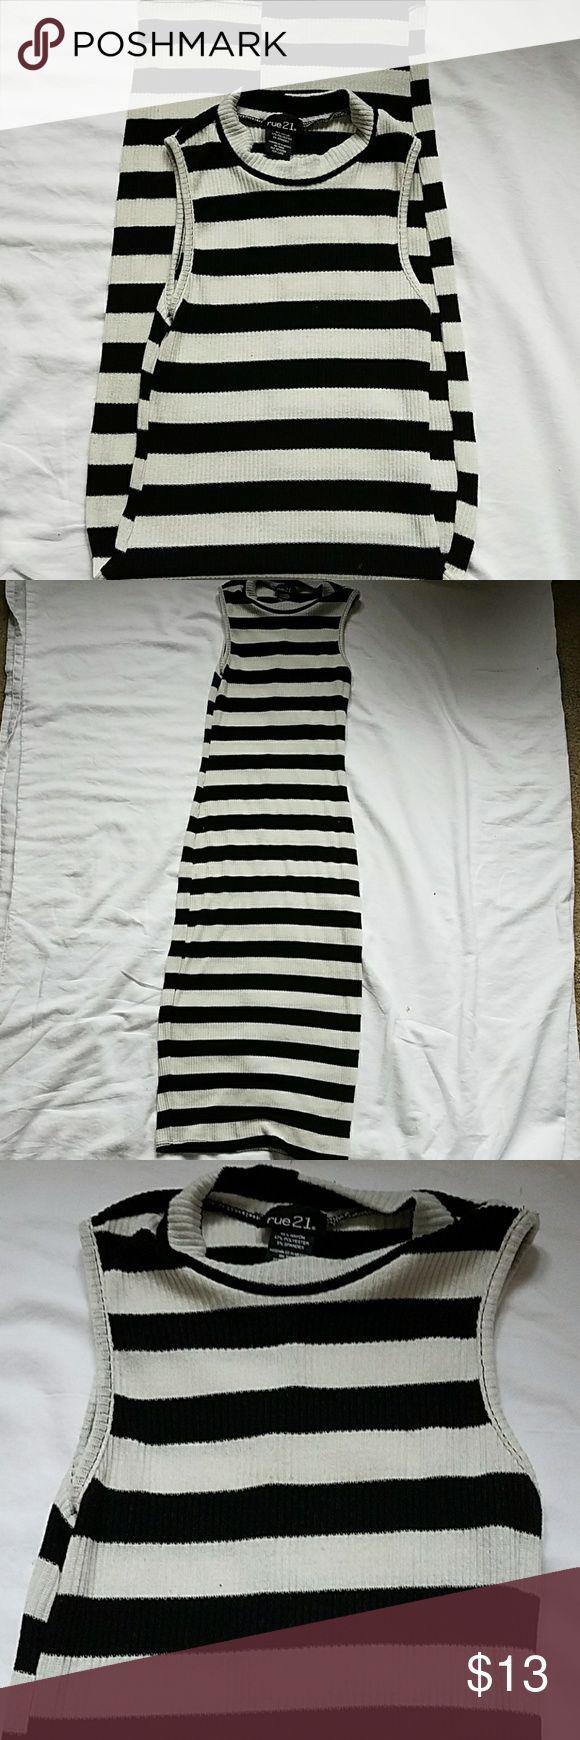 Striped body con midi dress Black and white stripes, high neck, midi length, white is very faded Rue 21 Dresses Midi